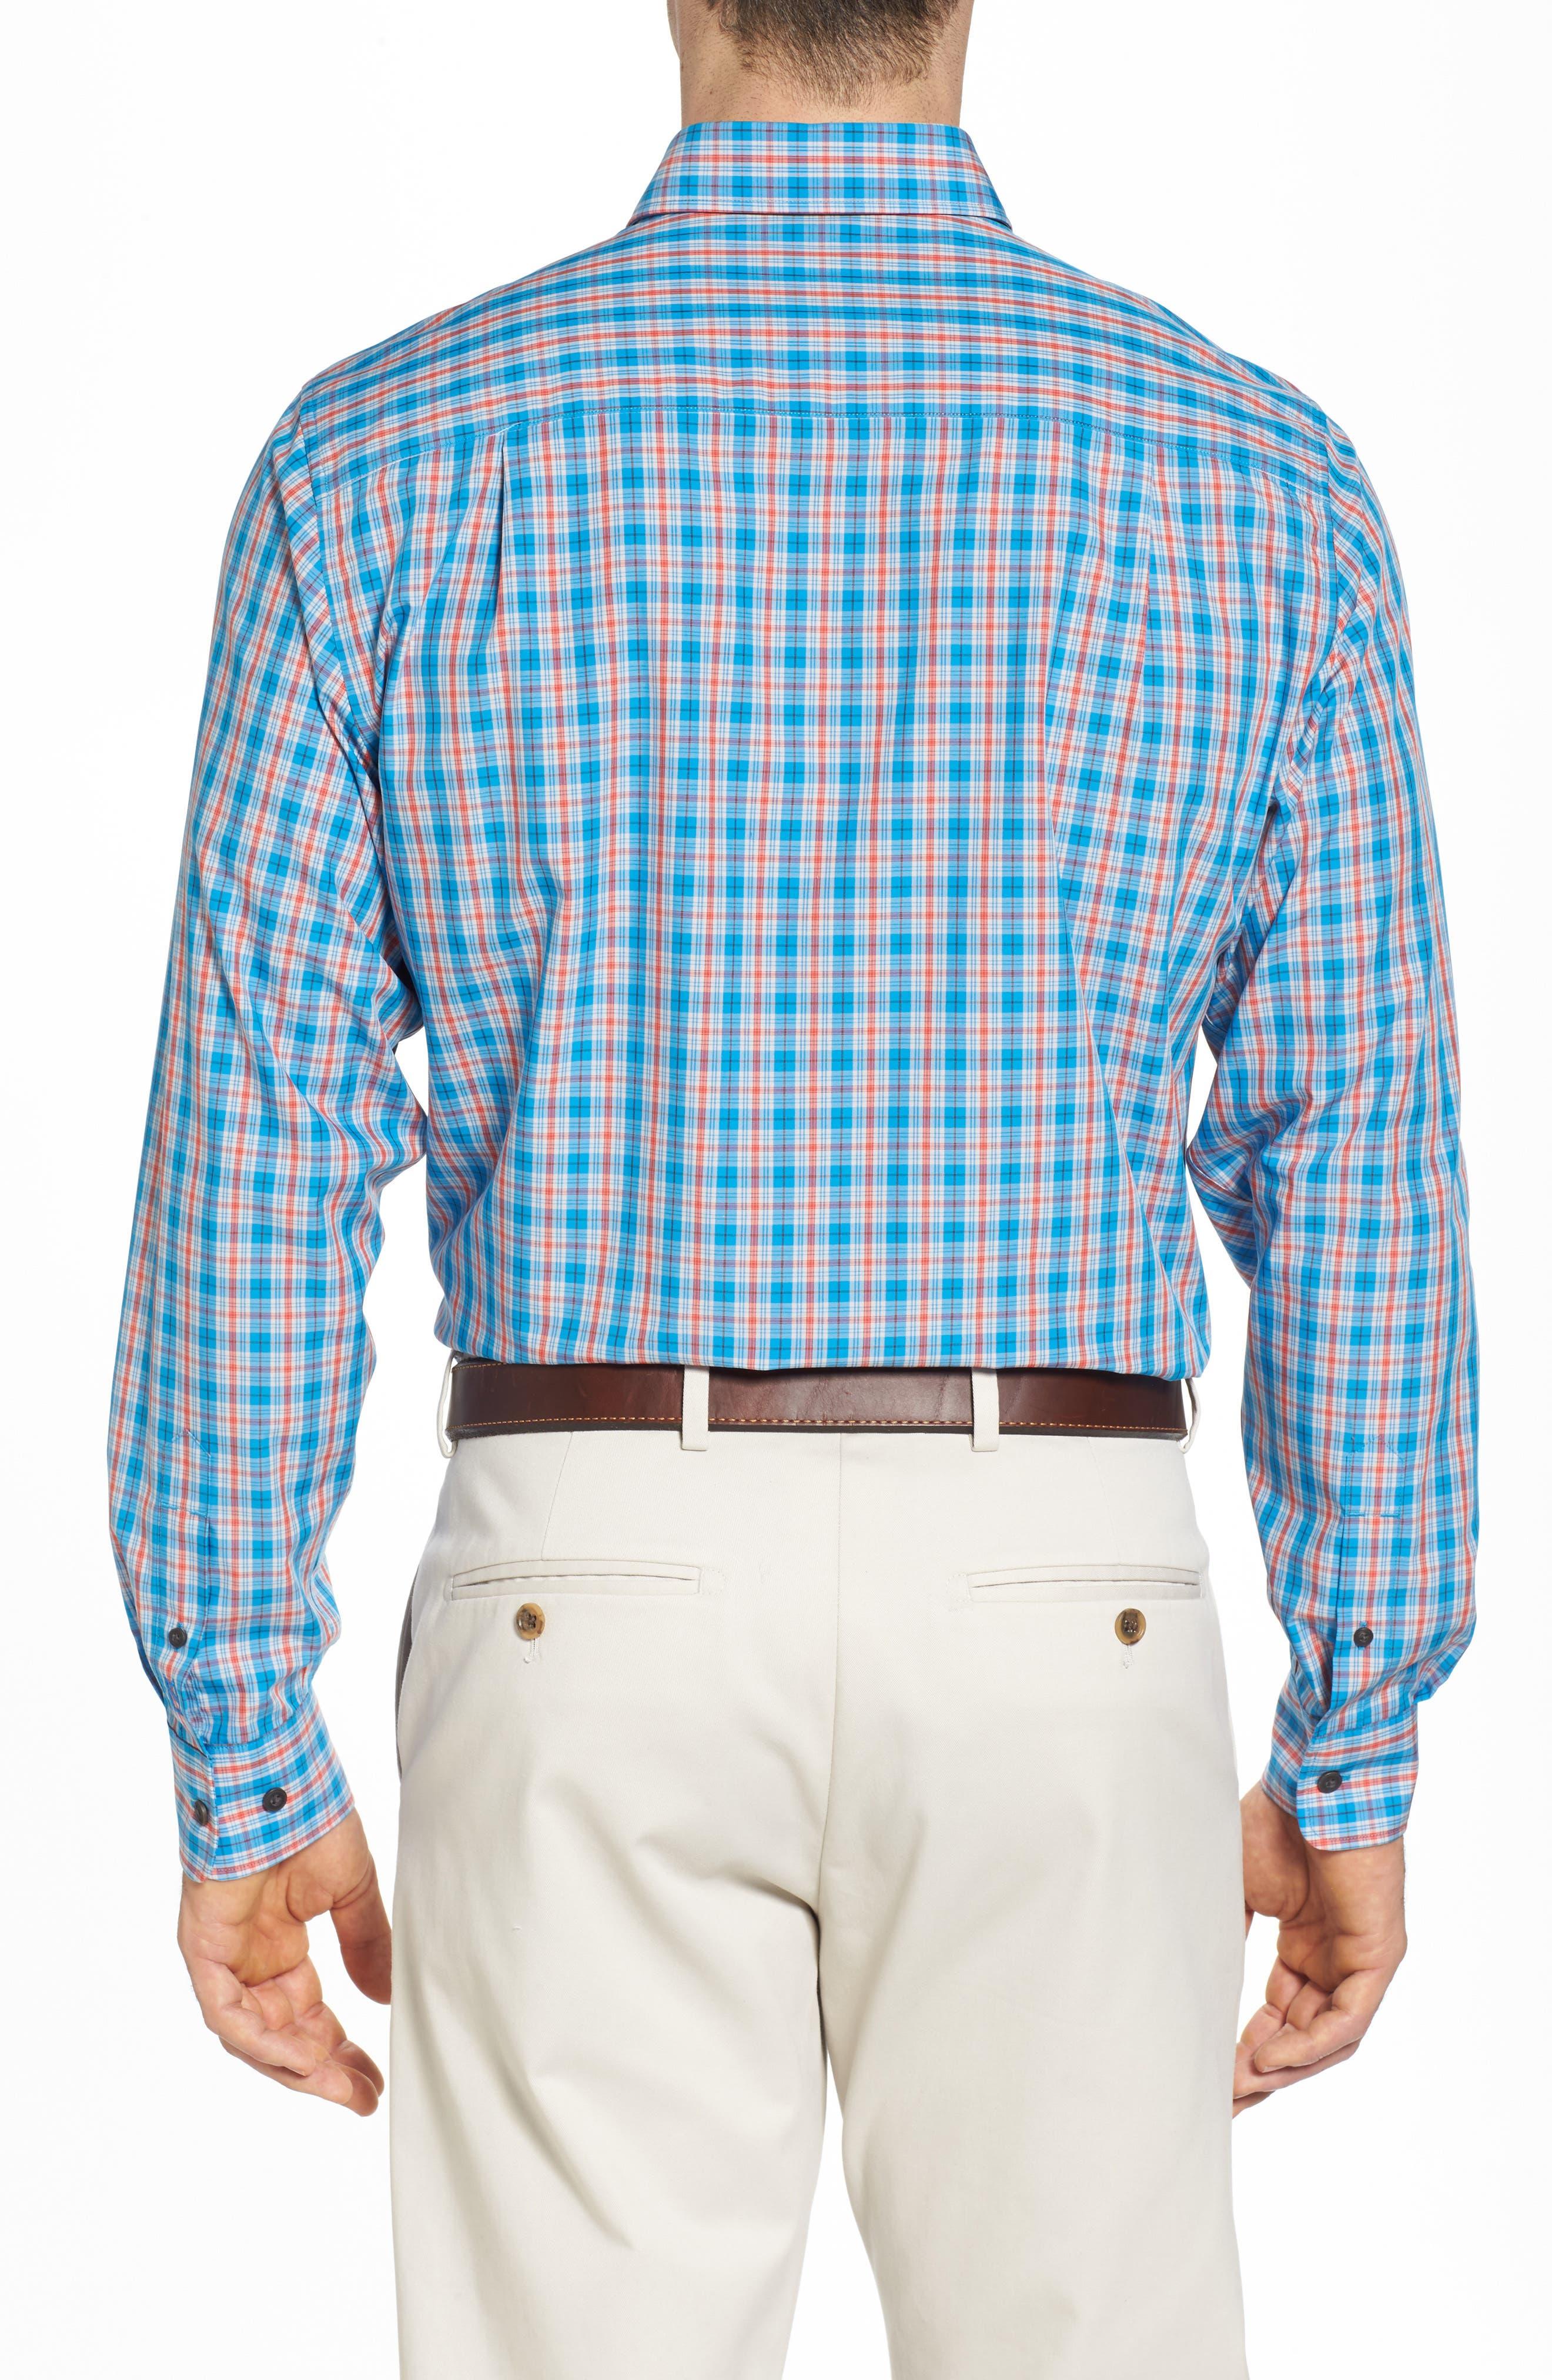 Landon Classic Fit Non-Iron Plaid Sport Shirt,                             Alternate thumbnail 2, color,                             Poolside